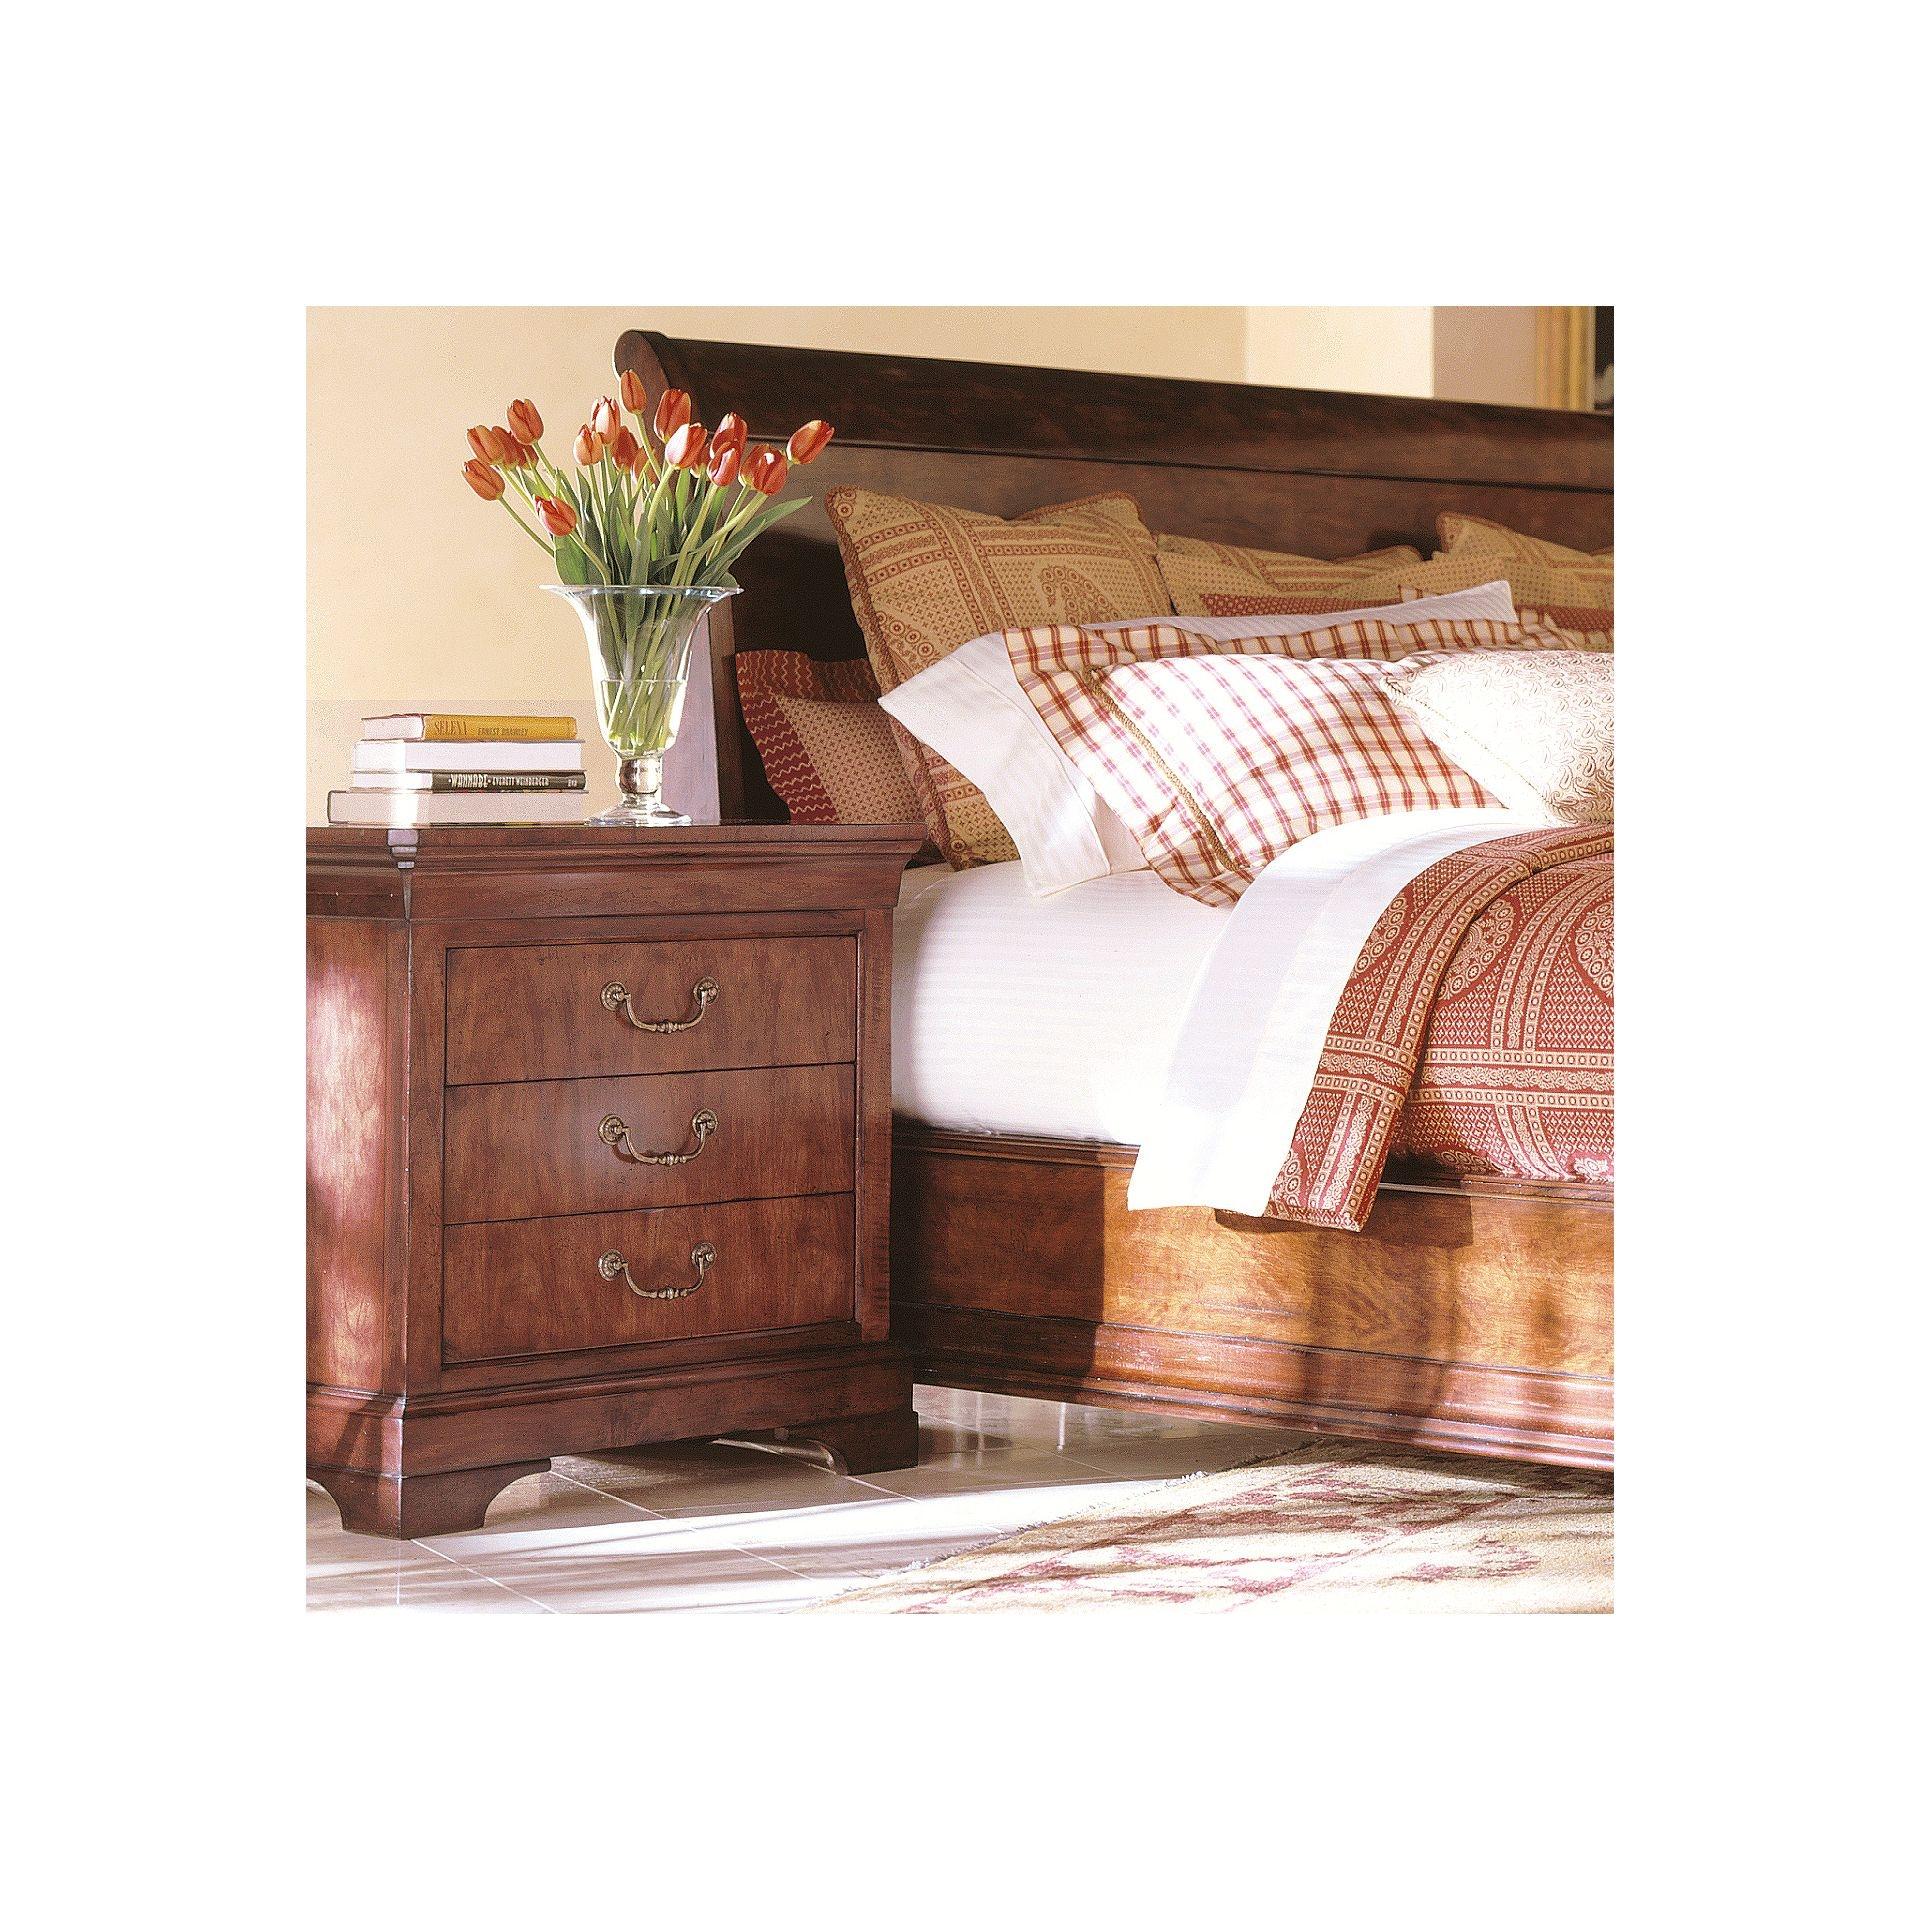 Henredon Furniture Cavalier Night Stand 6200 06 93